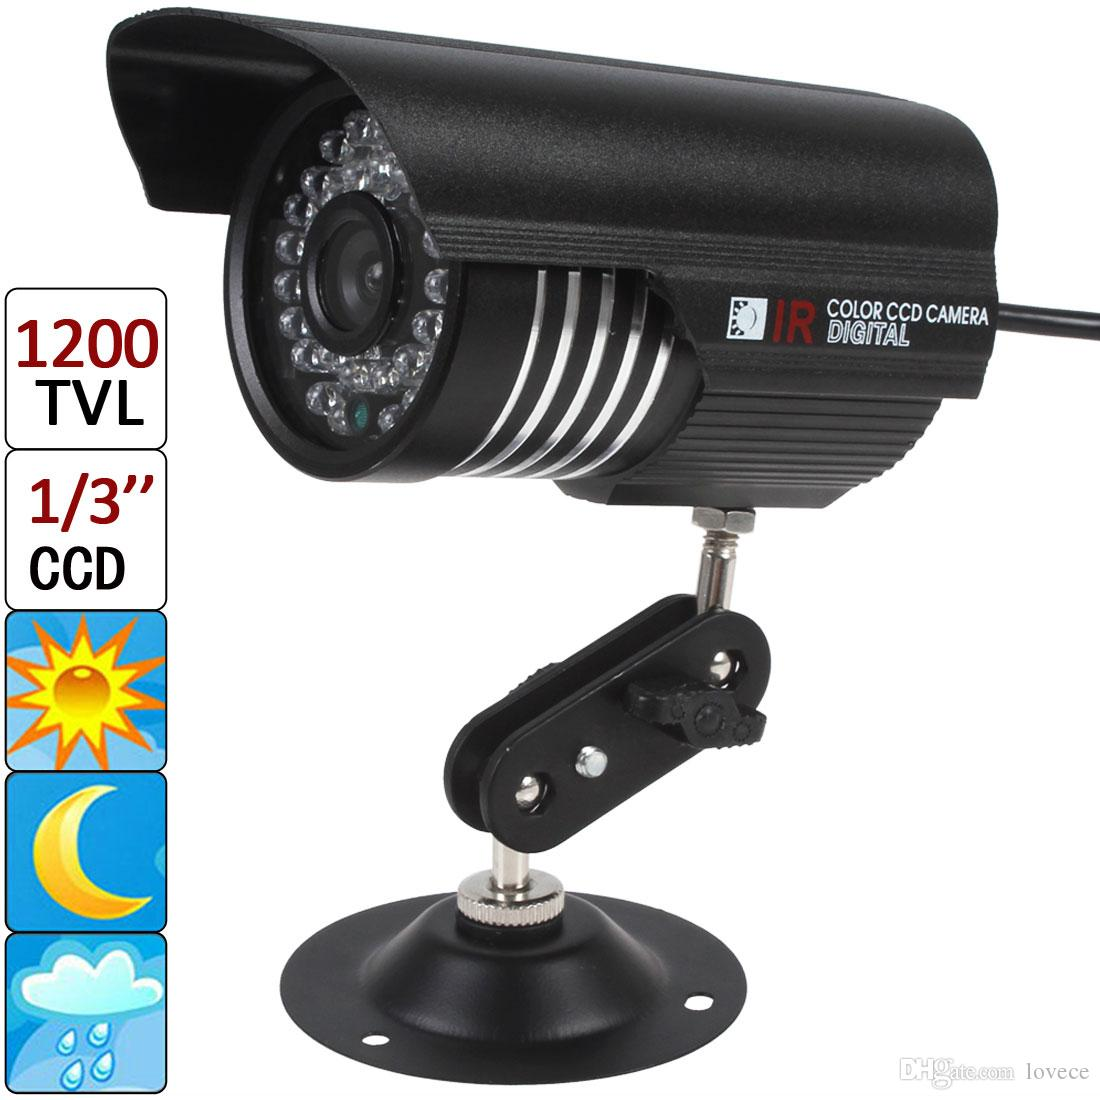 "1200 TVL 6mm Lens 36 IR LEDs IP66 Waterproof Night Vision CCTV Bullet Camera with Sony 1/3"" CCD Sensor CCT_638"